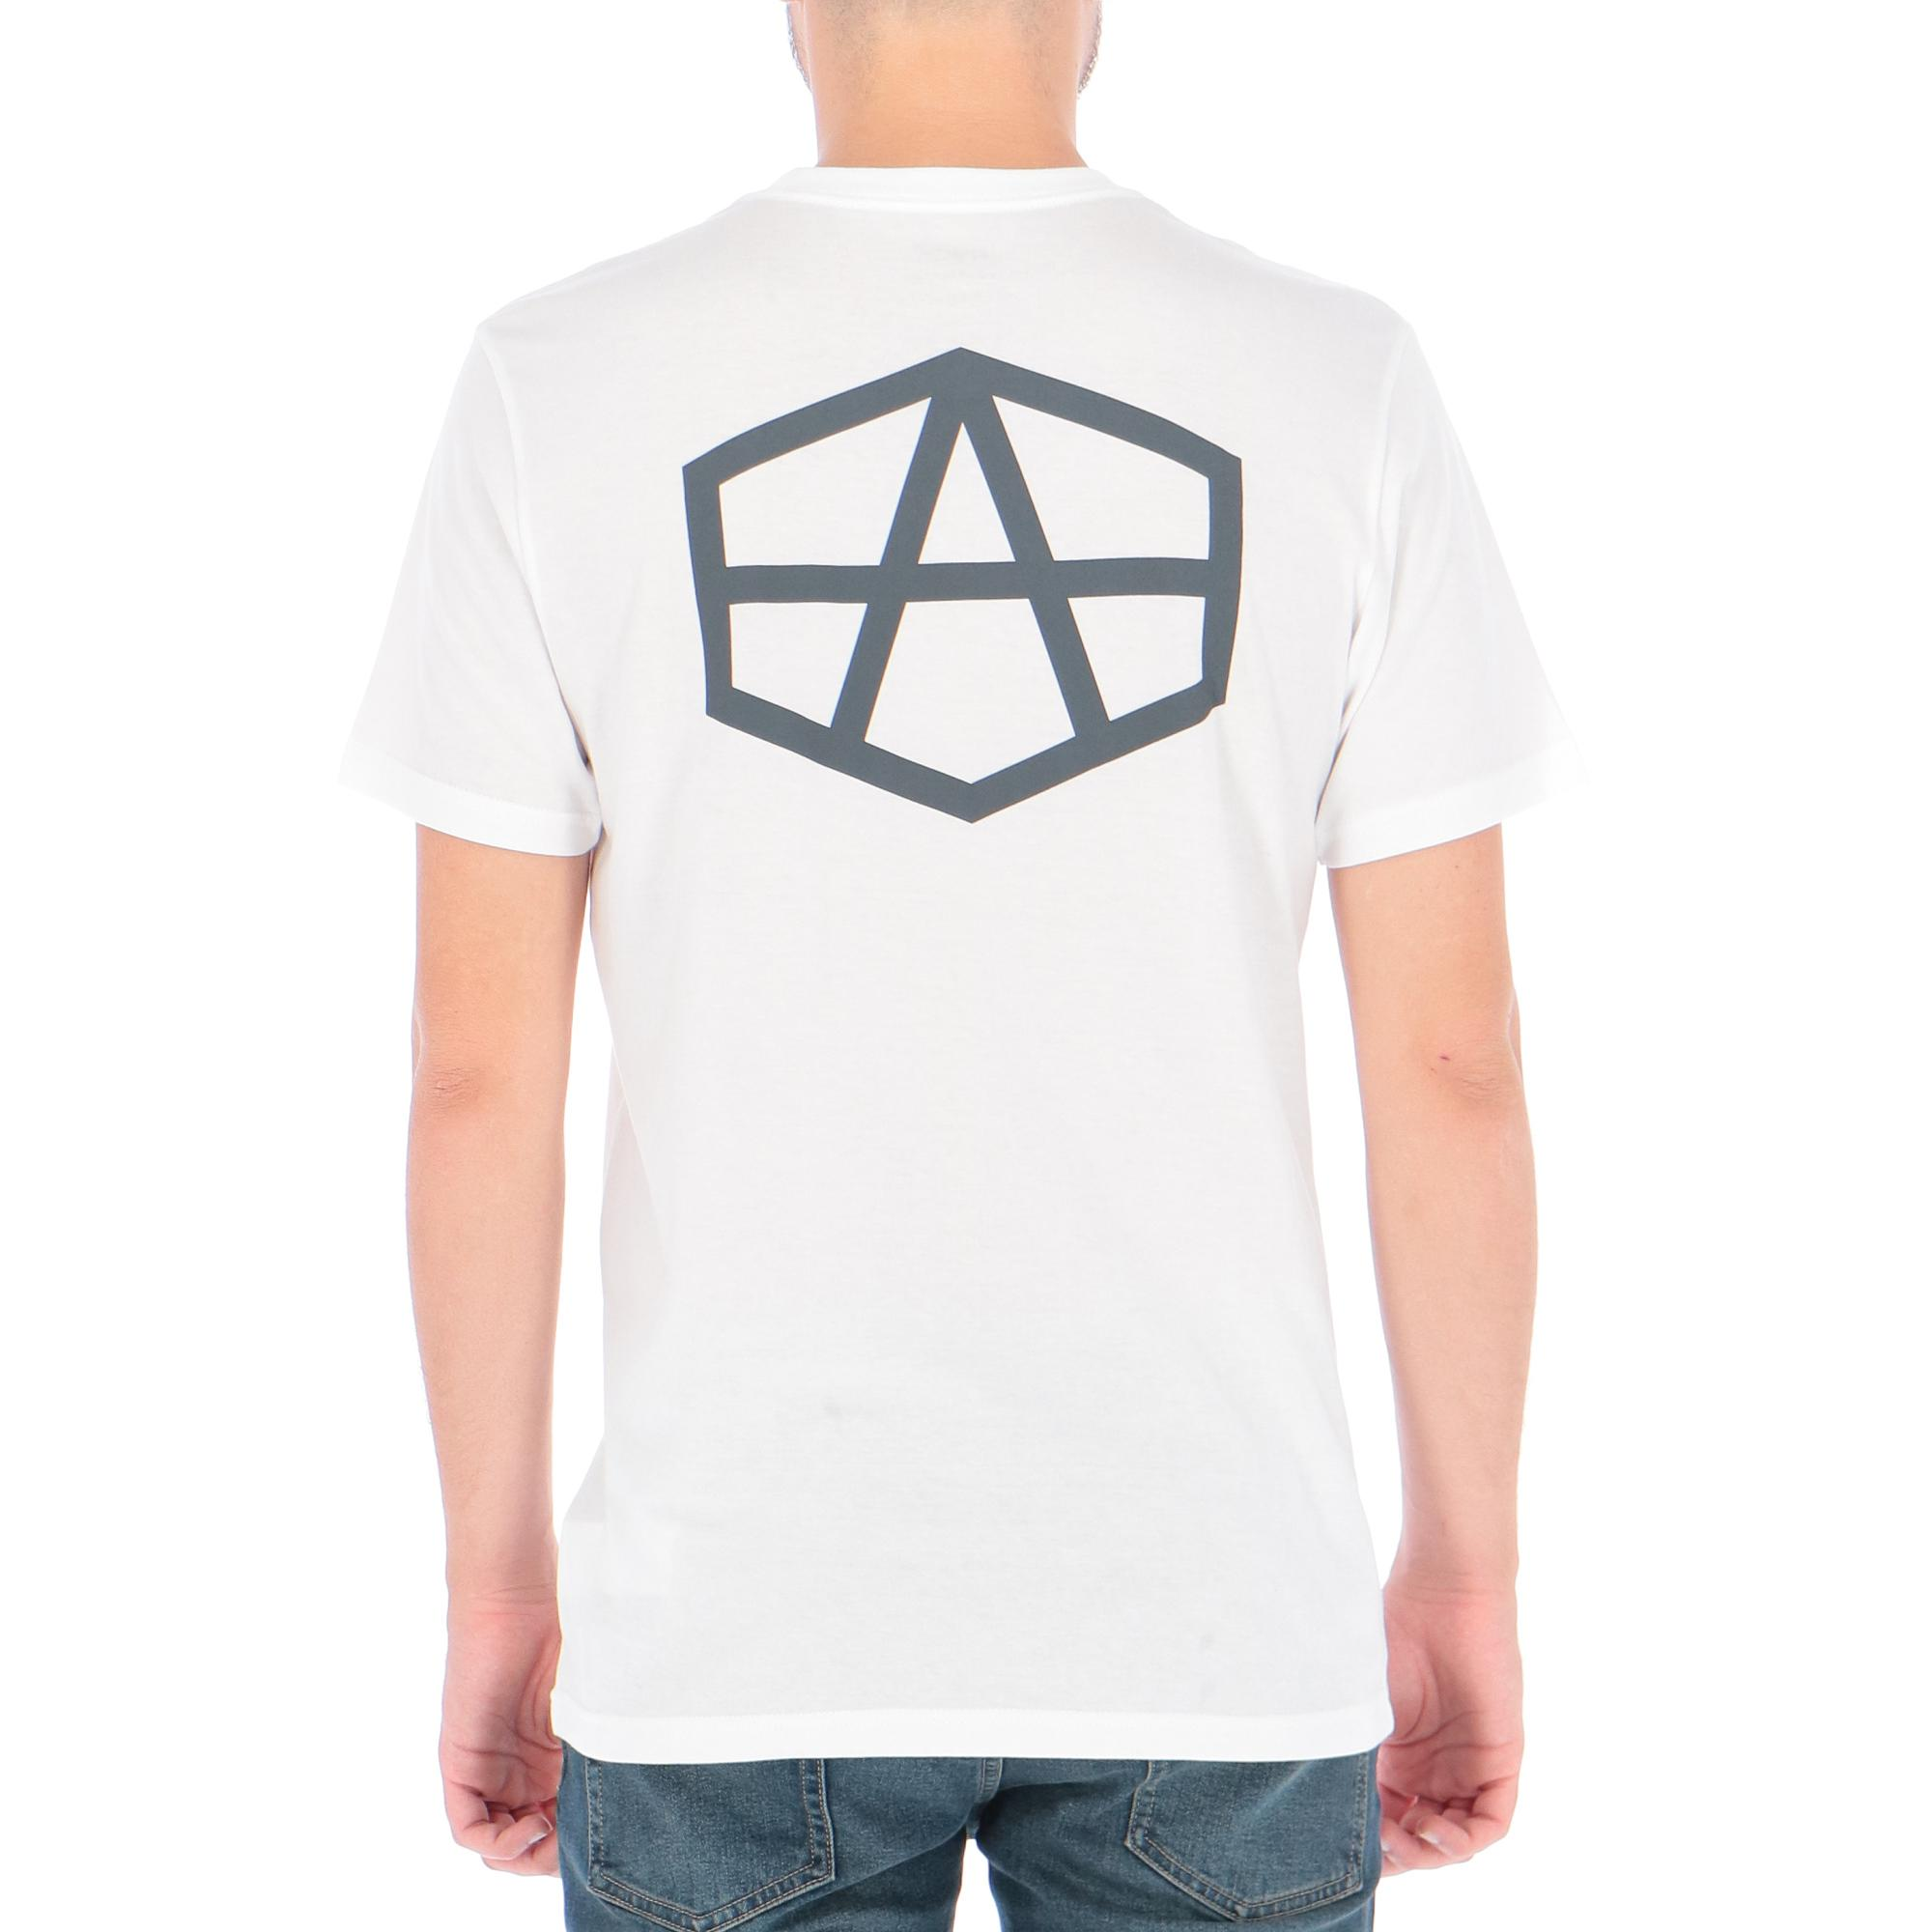 Rvca X Andrew Reynolds Hex T-shirt WHITE